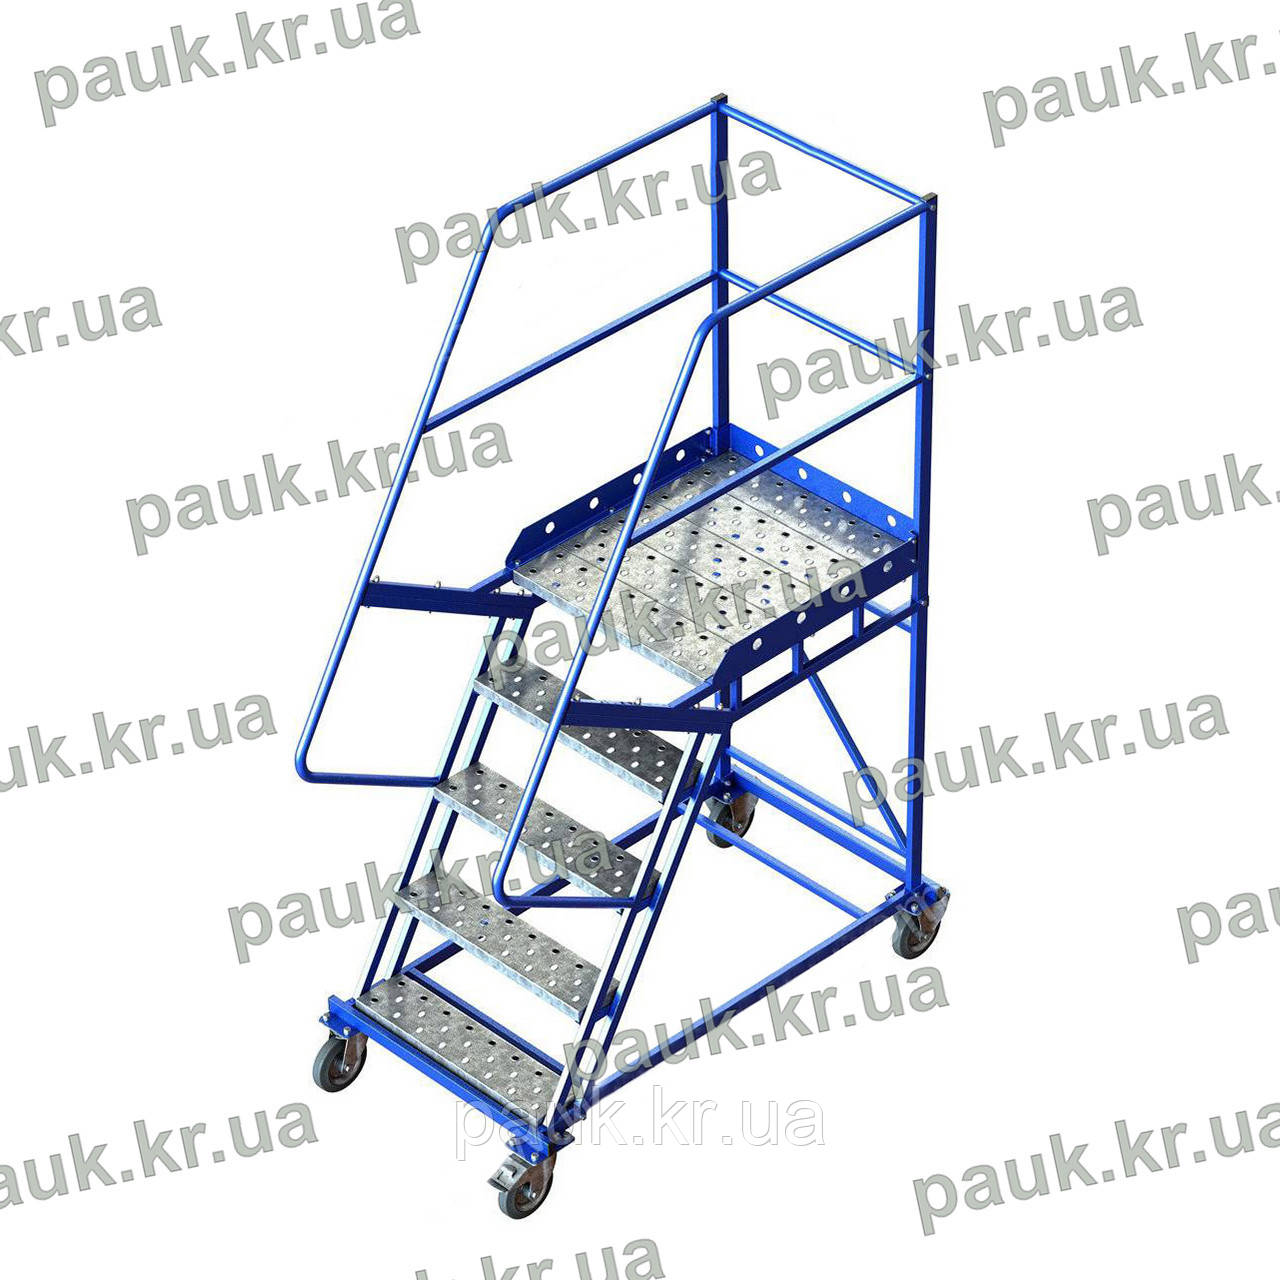 Драбина платформна Н1250 мм, пересувна сталева складська